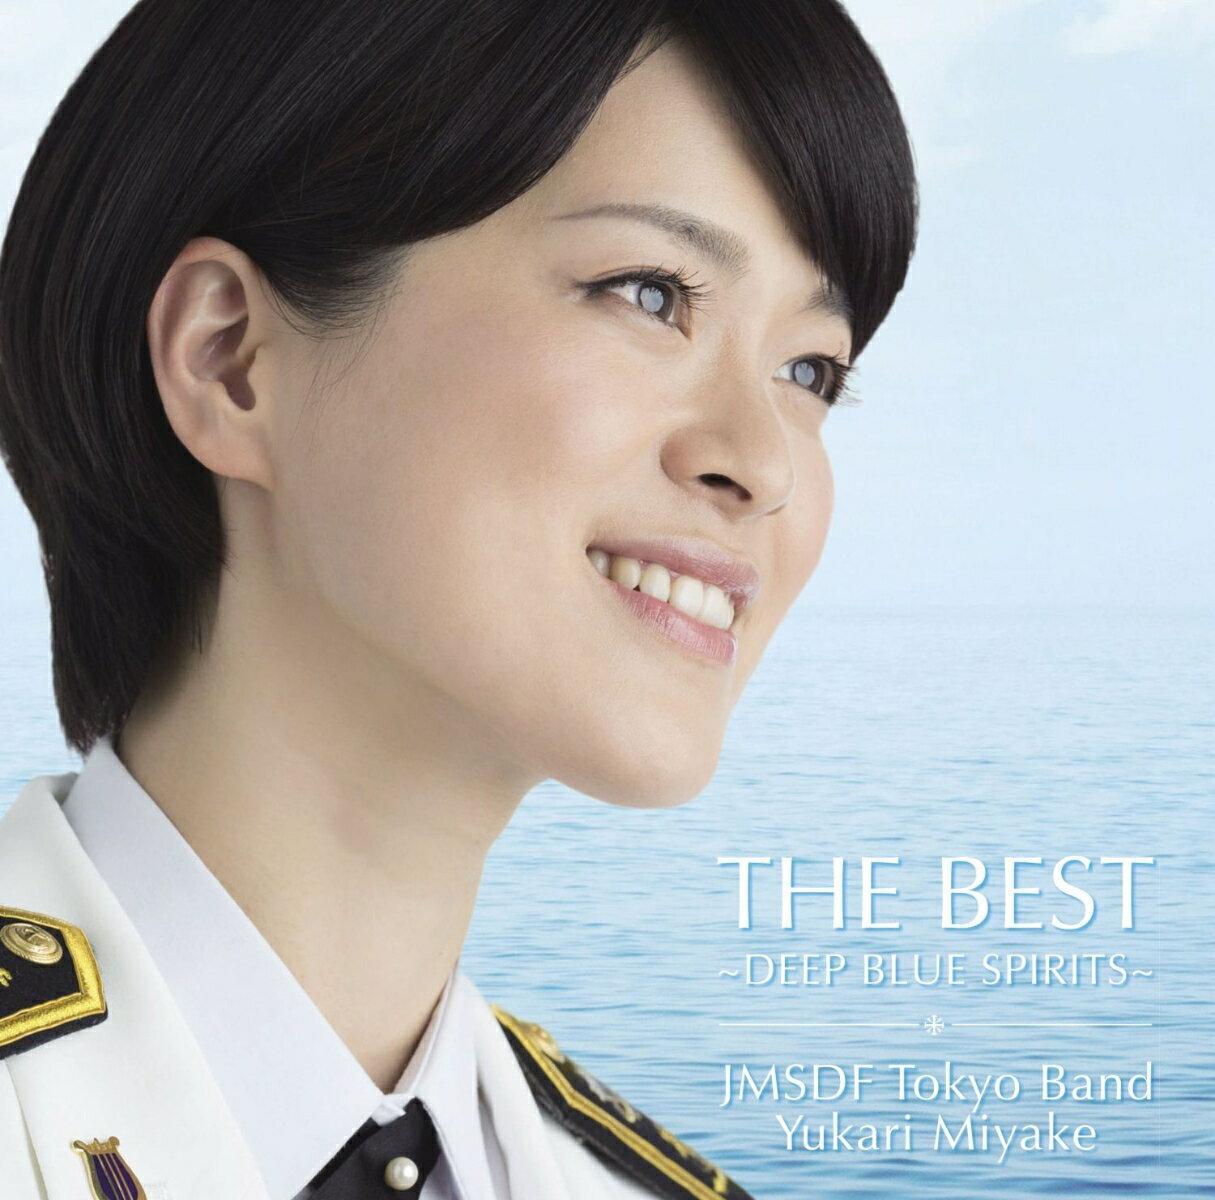 THE BEST 〜DEEP BLUE SPIRITS〜 [ 海上自衛隊東京音楽隊 ]